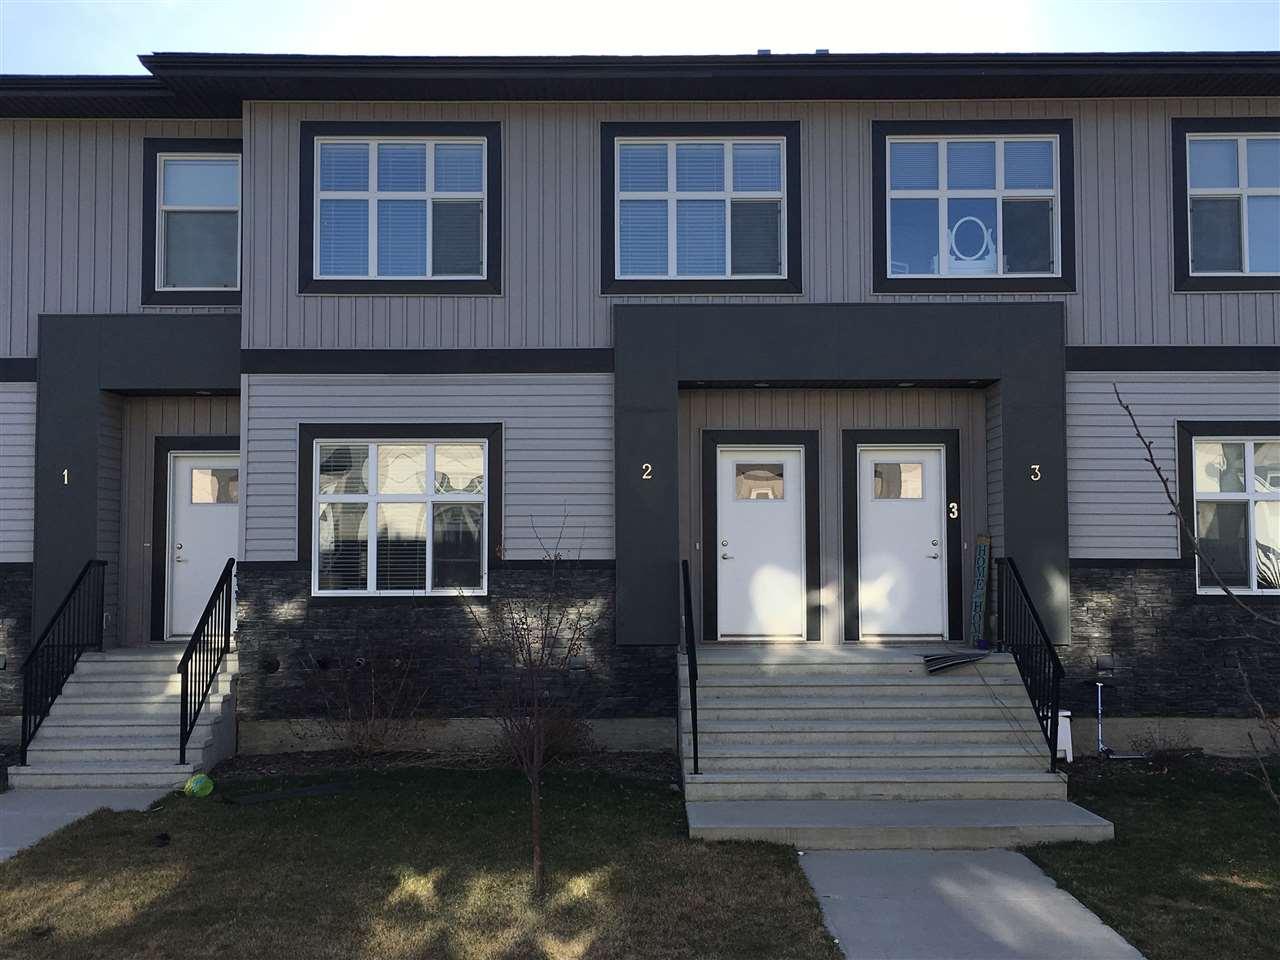 MLS® listing #E4153785 for sale located at 2 20 VANDERBILT Common